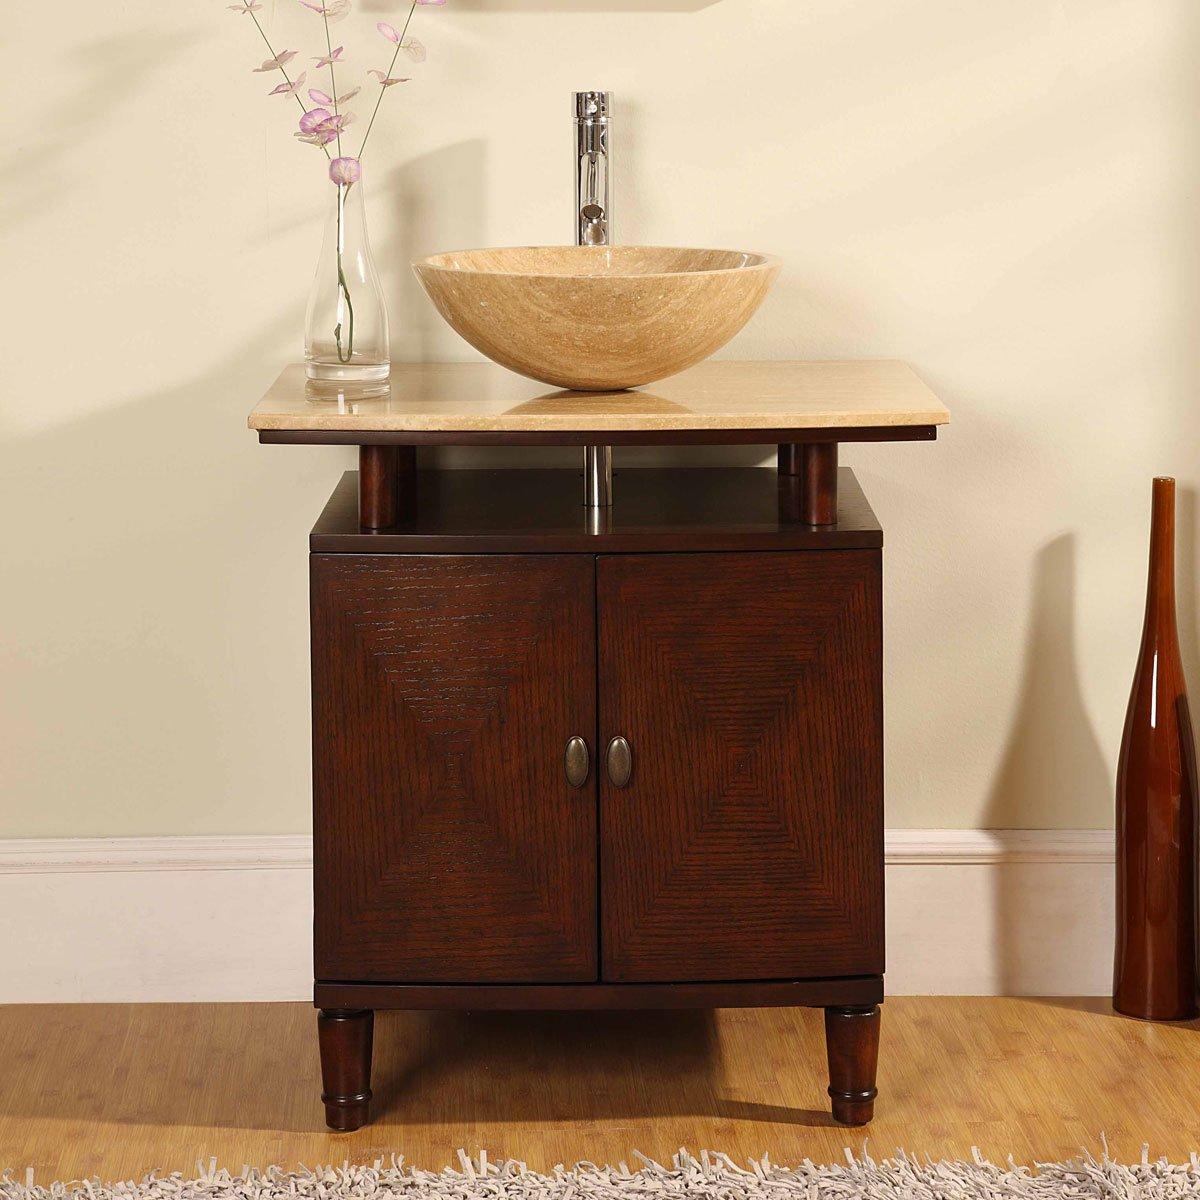 Amazon.com: Silkroad Exclusive Modern Sink Vessel Bathroom Vanity With Powder  Room Cabinet, 29 Inch: Home U0026 Kitchen